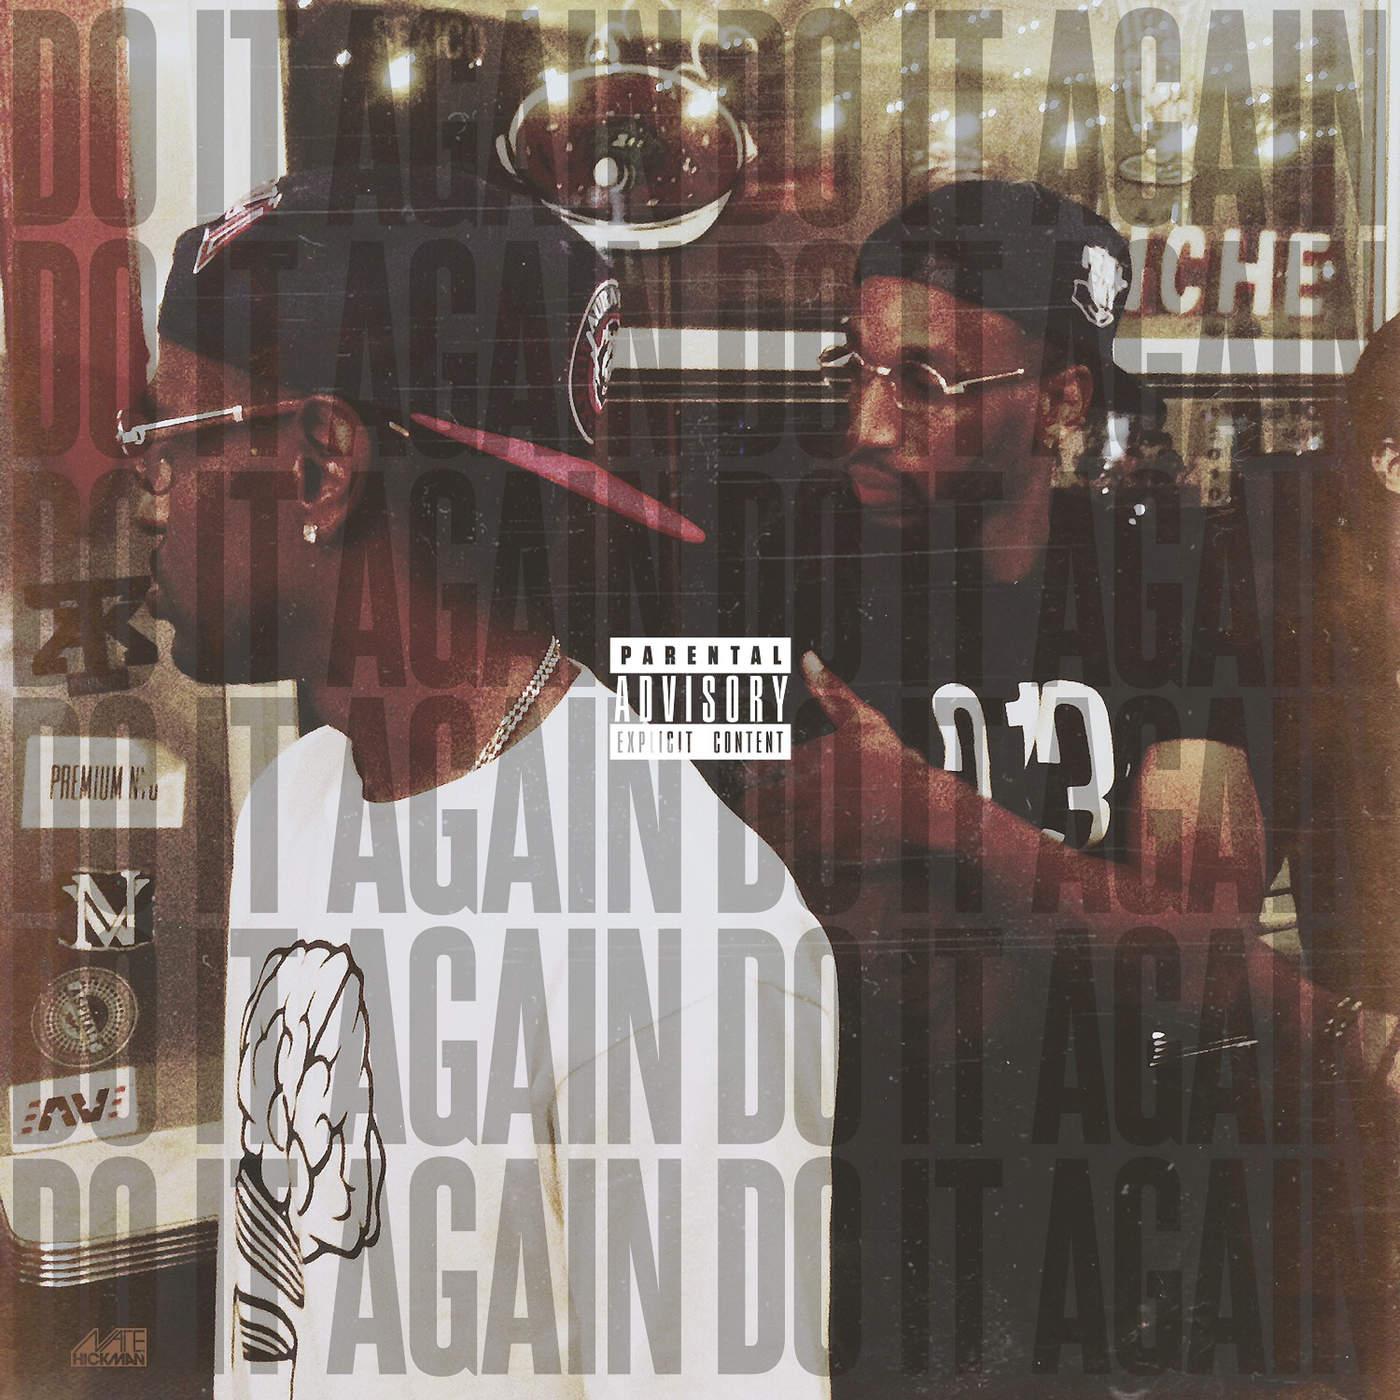 Earlly Mac - Do It Again (feat. Big Sean) - Single Cover